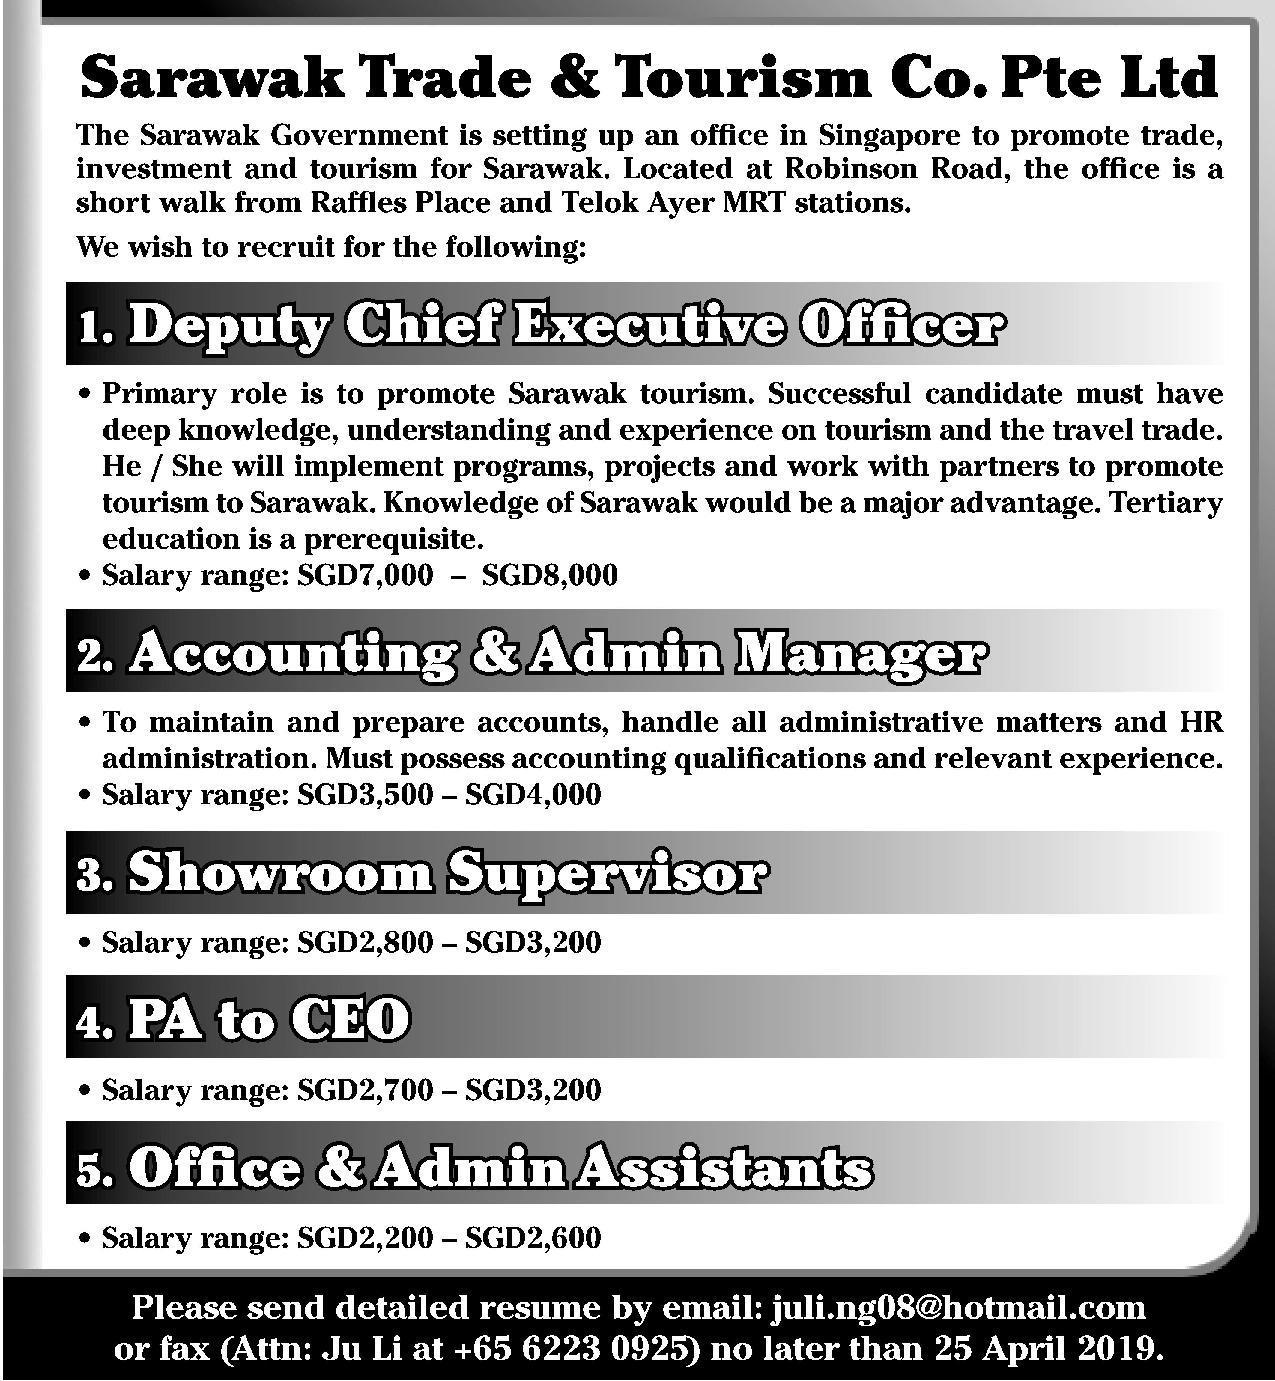 Showroom Supervisor in a company Singapore Singapore